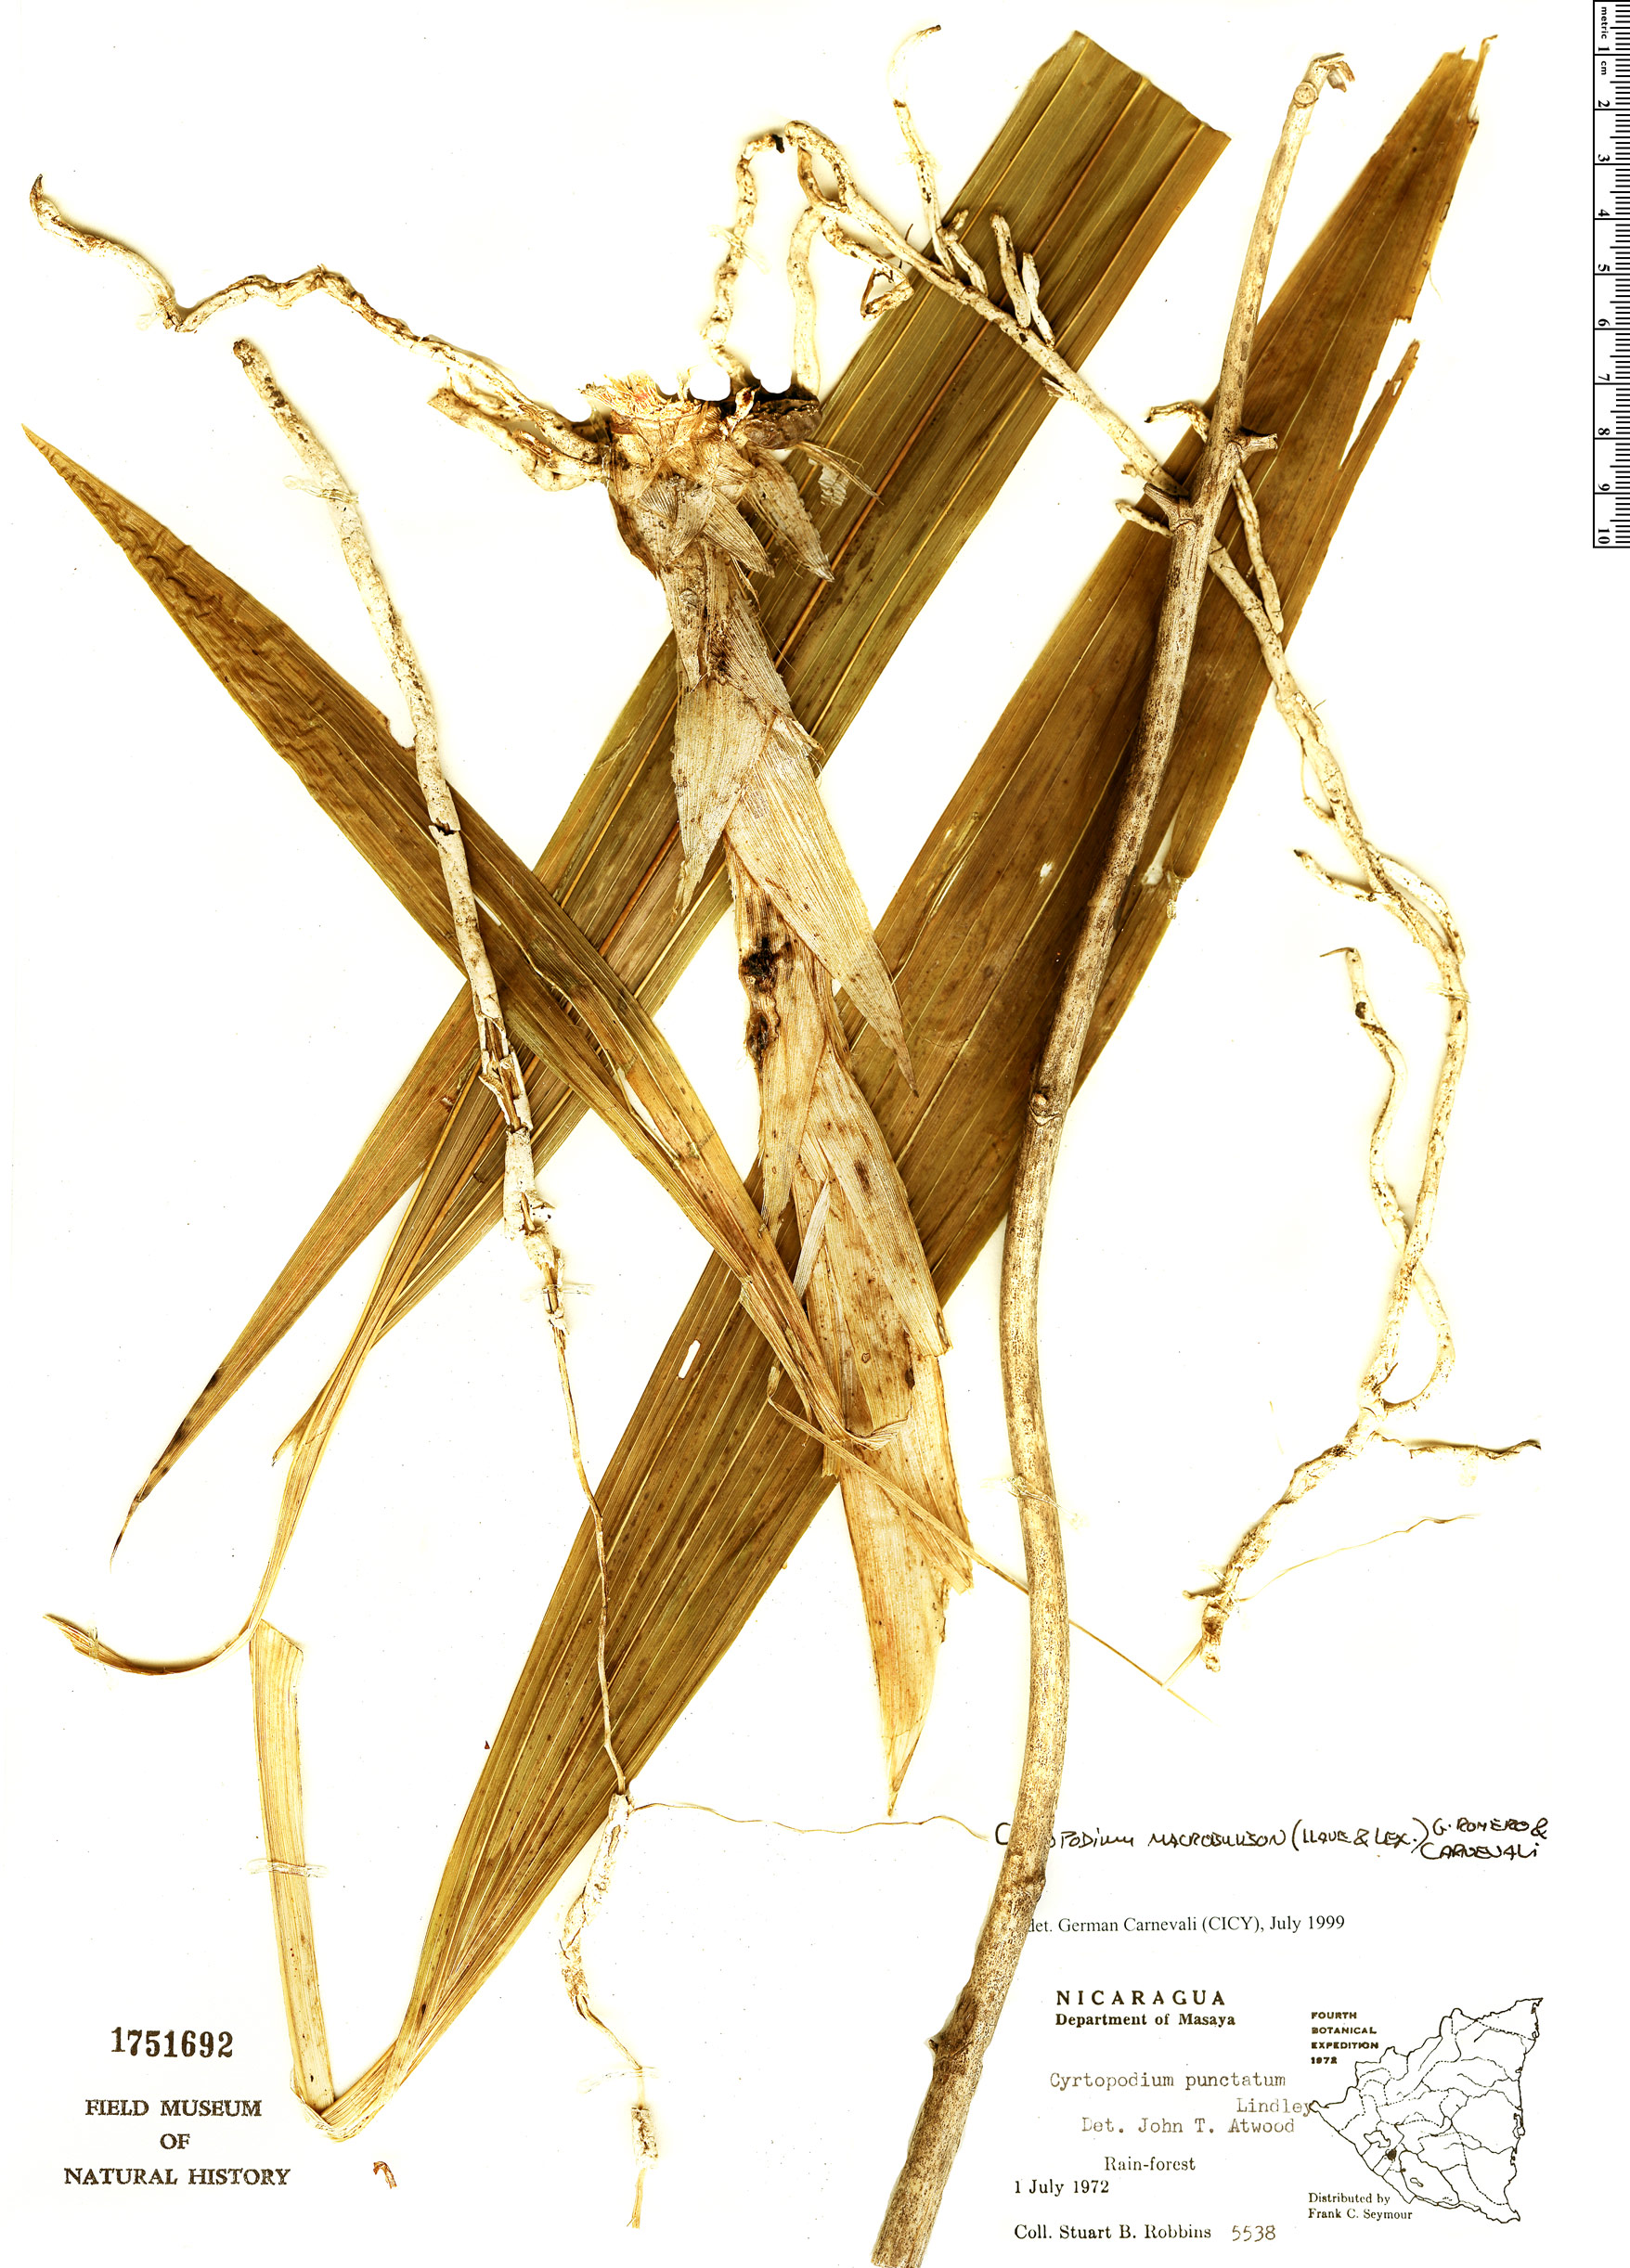 Specimen: Cyrtopodium macrobulbon